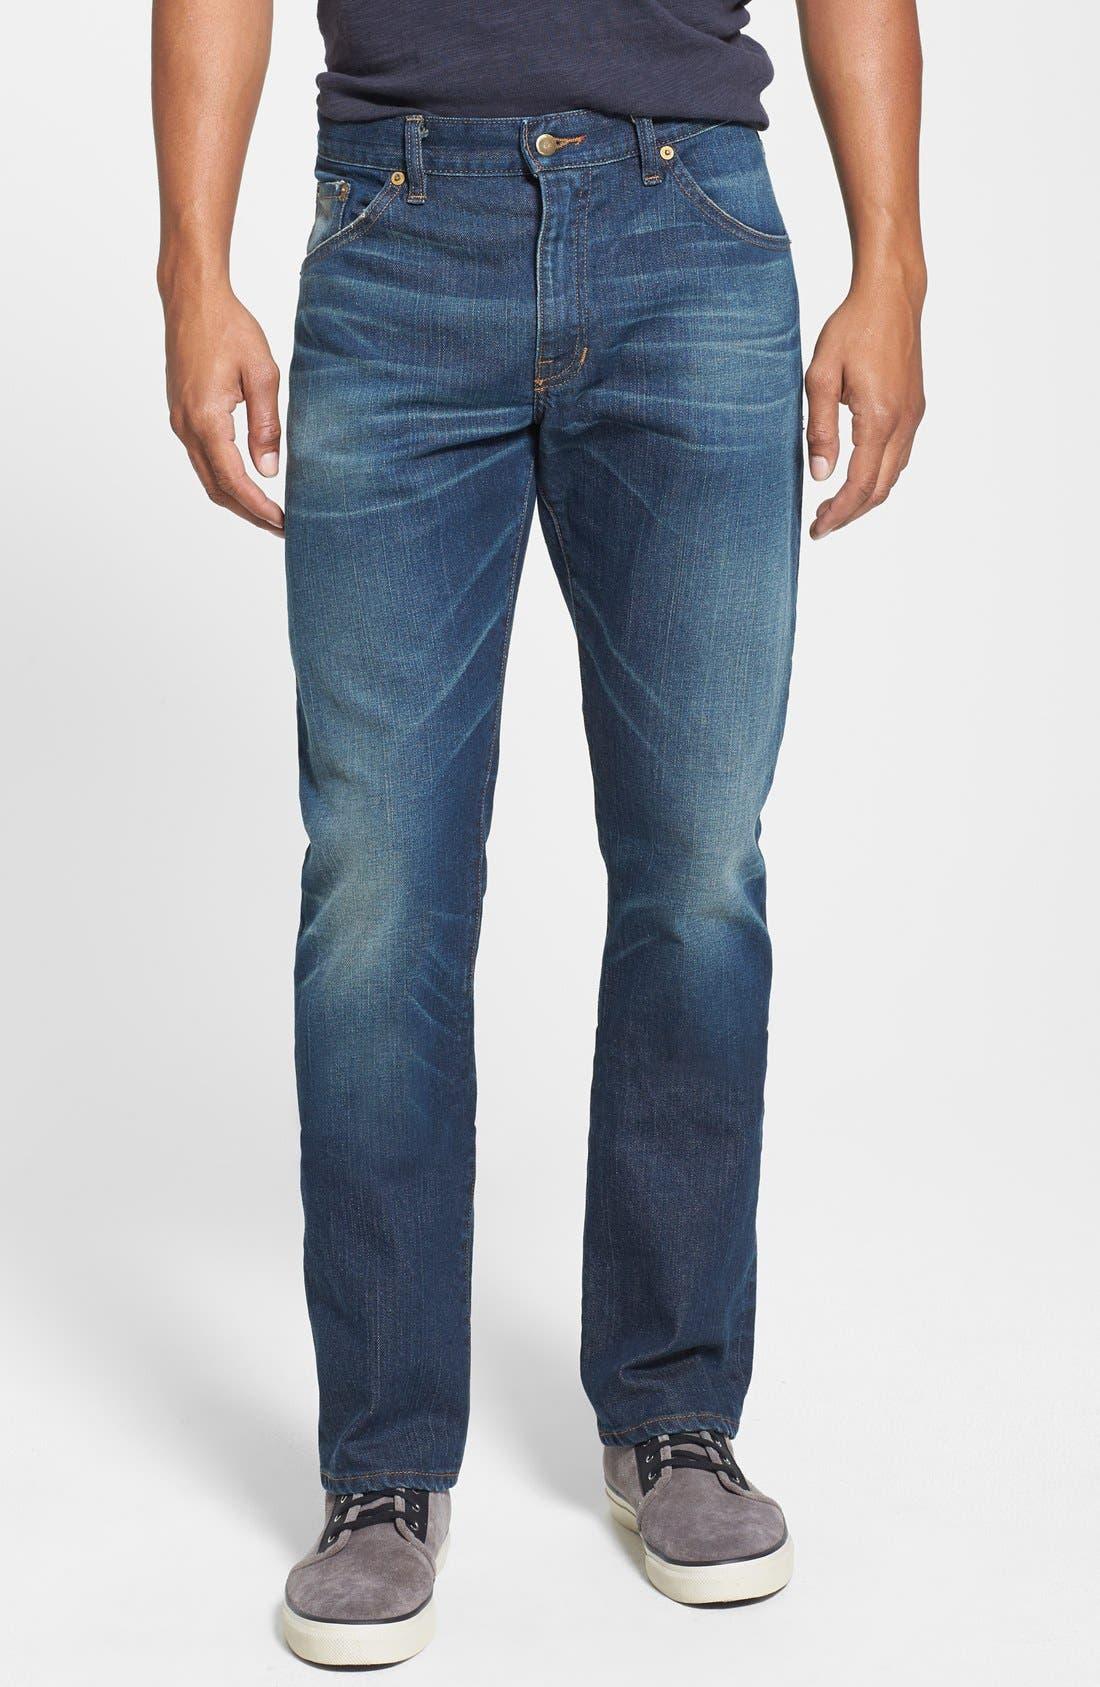 'Jones' Slim Straight Fit Jeans,                         Main,                         color, Camp